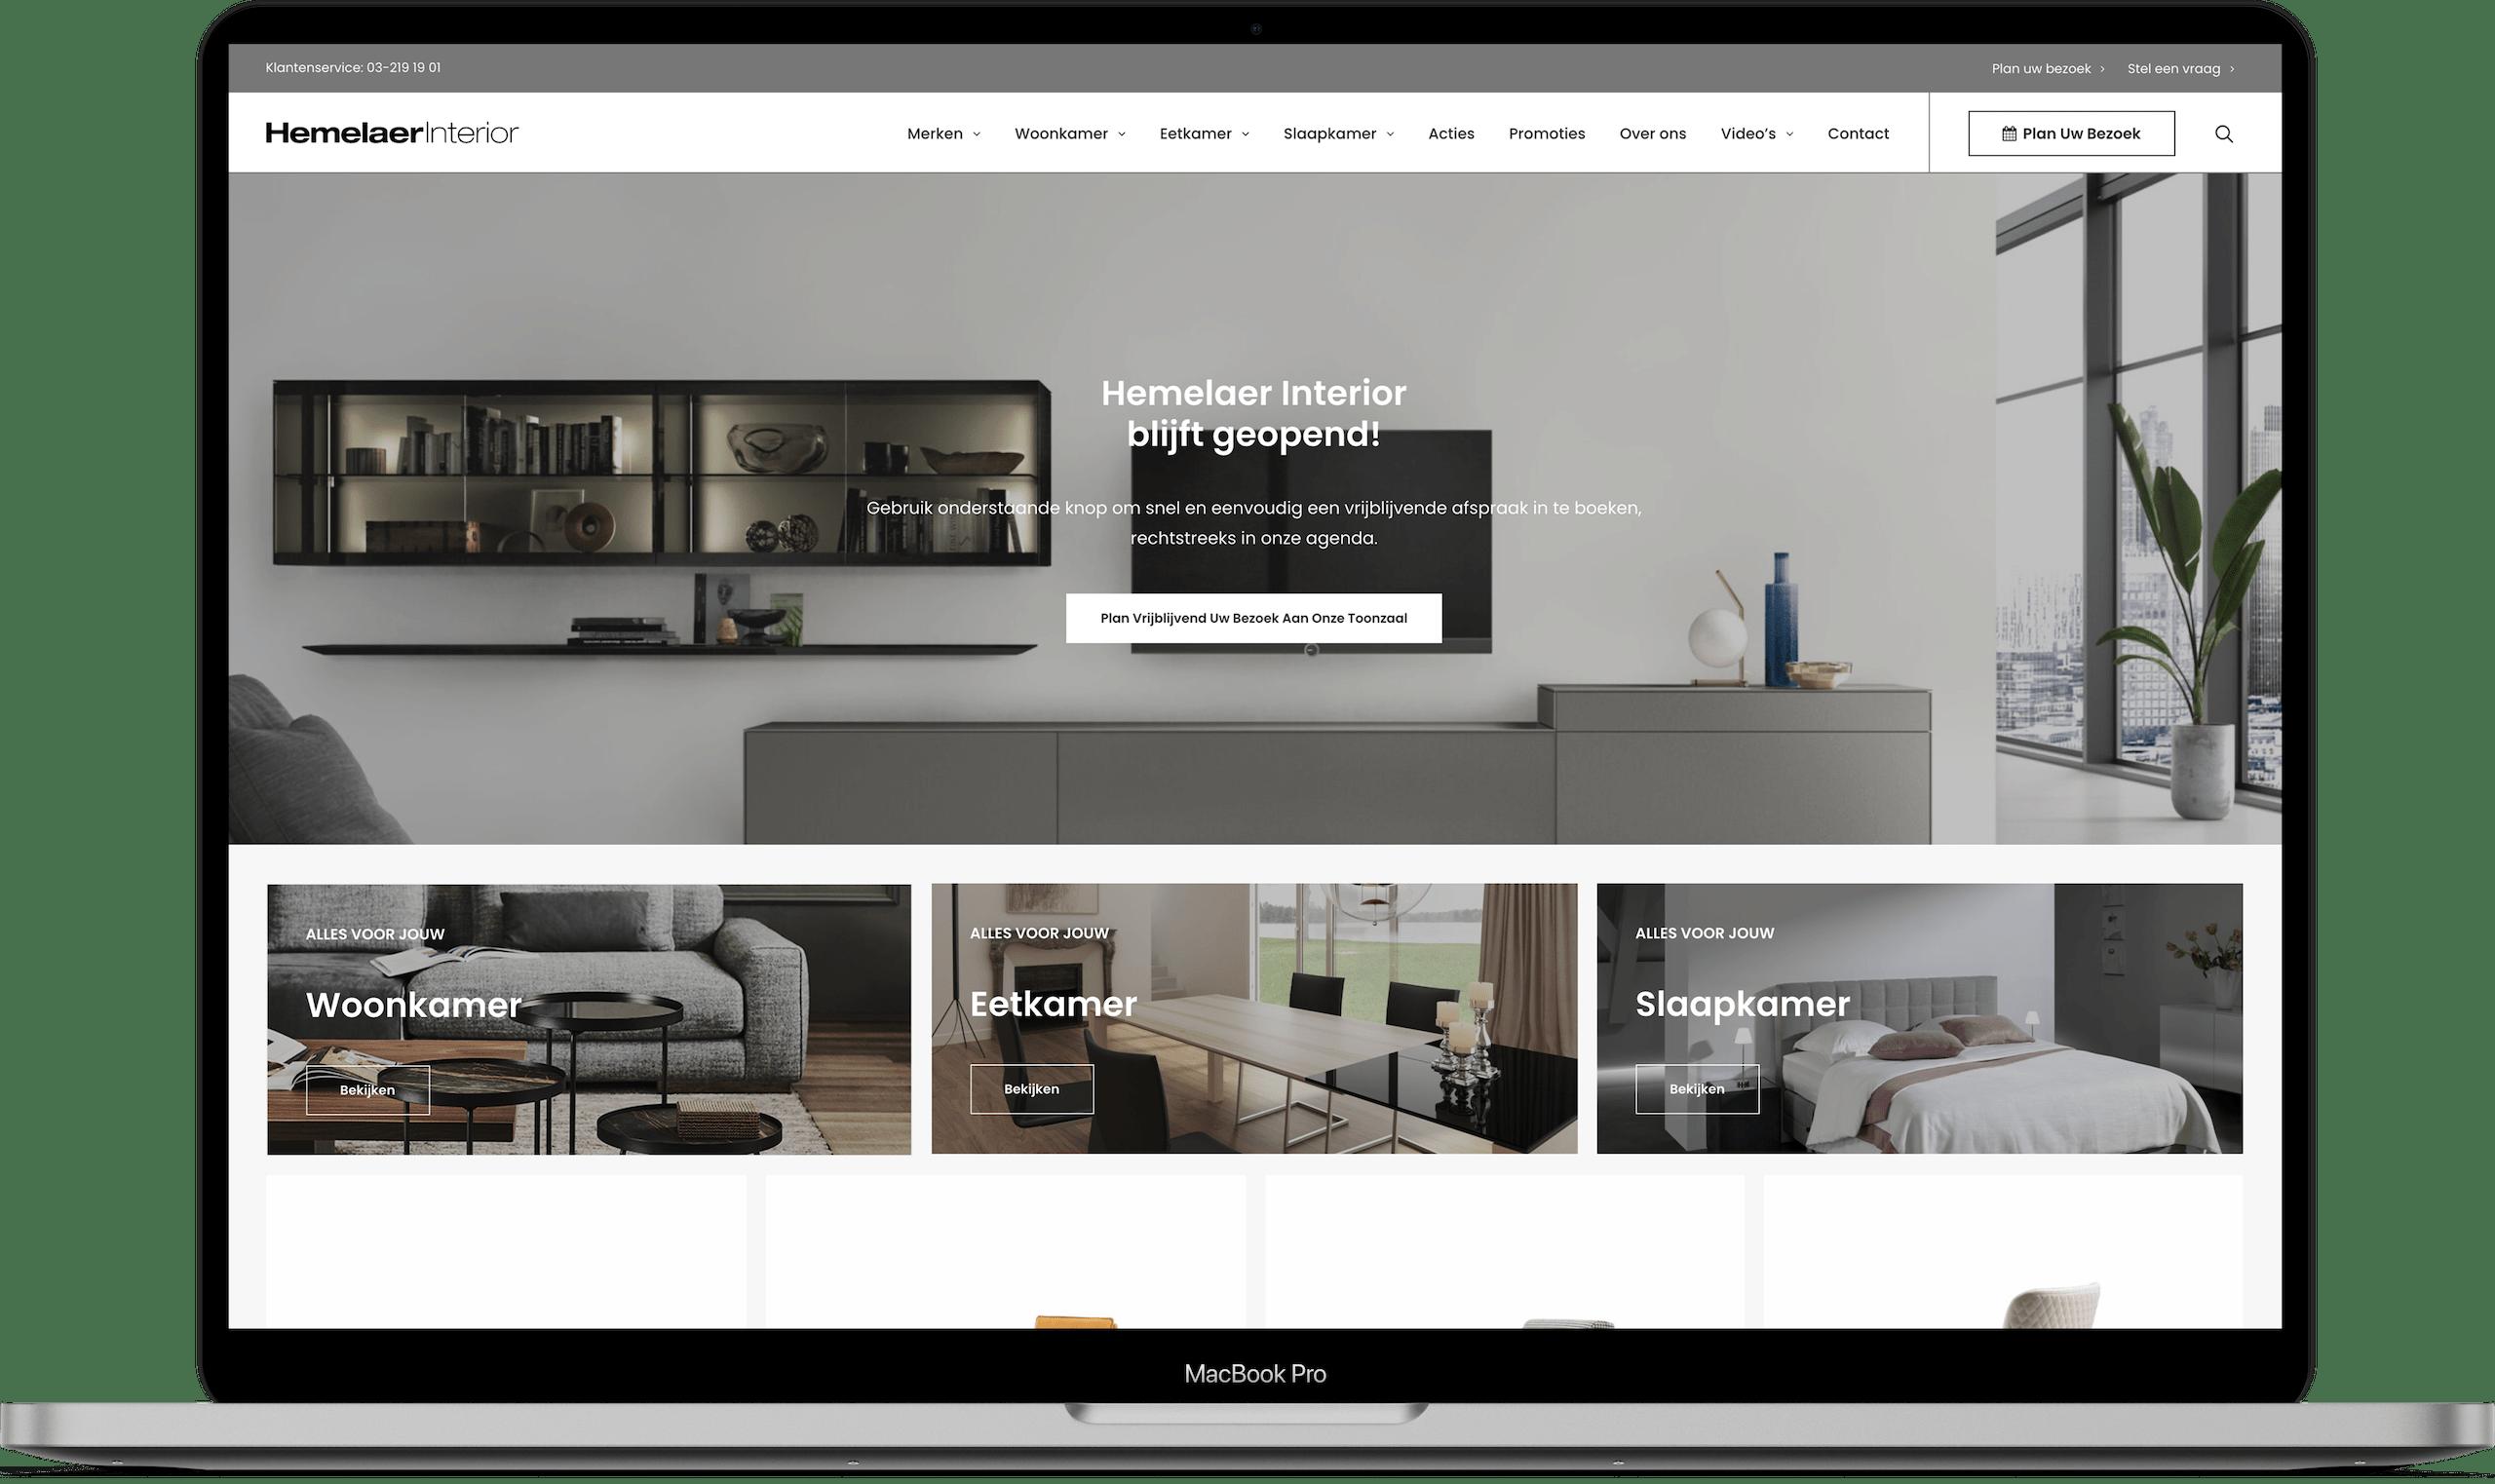 Larkom Webdesign in Londerzeel Hemelaer Interior website portfolio 0013